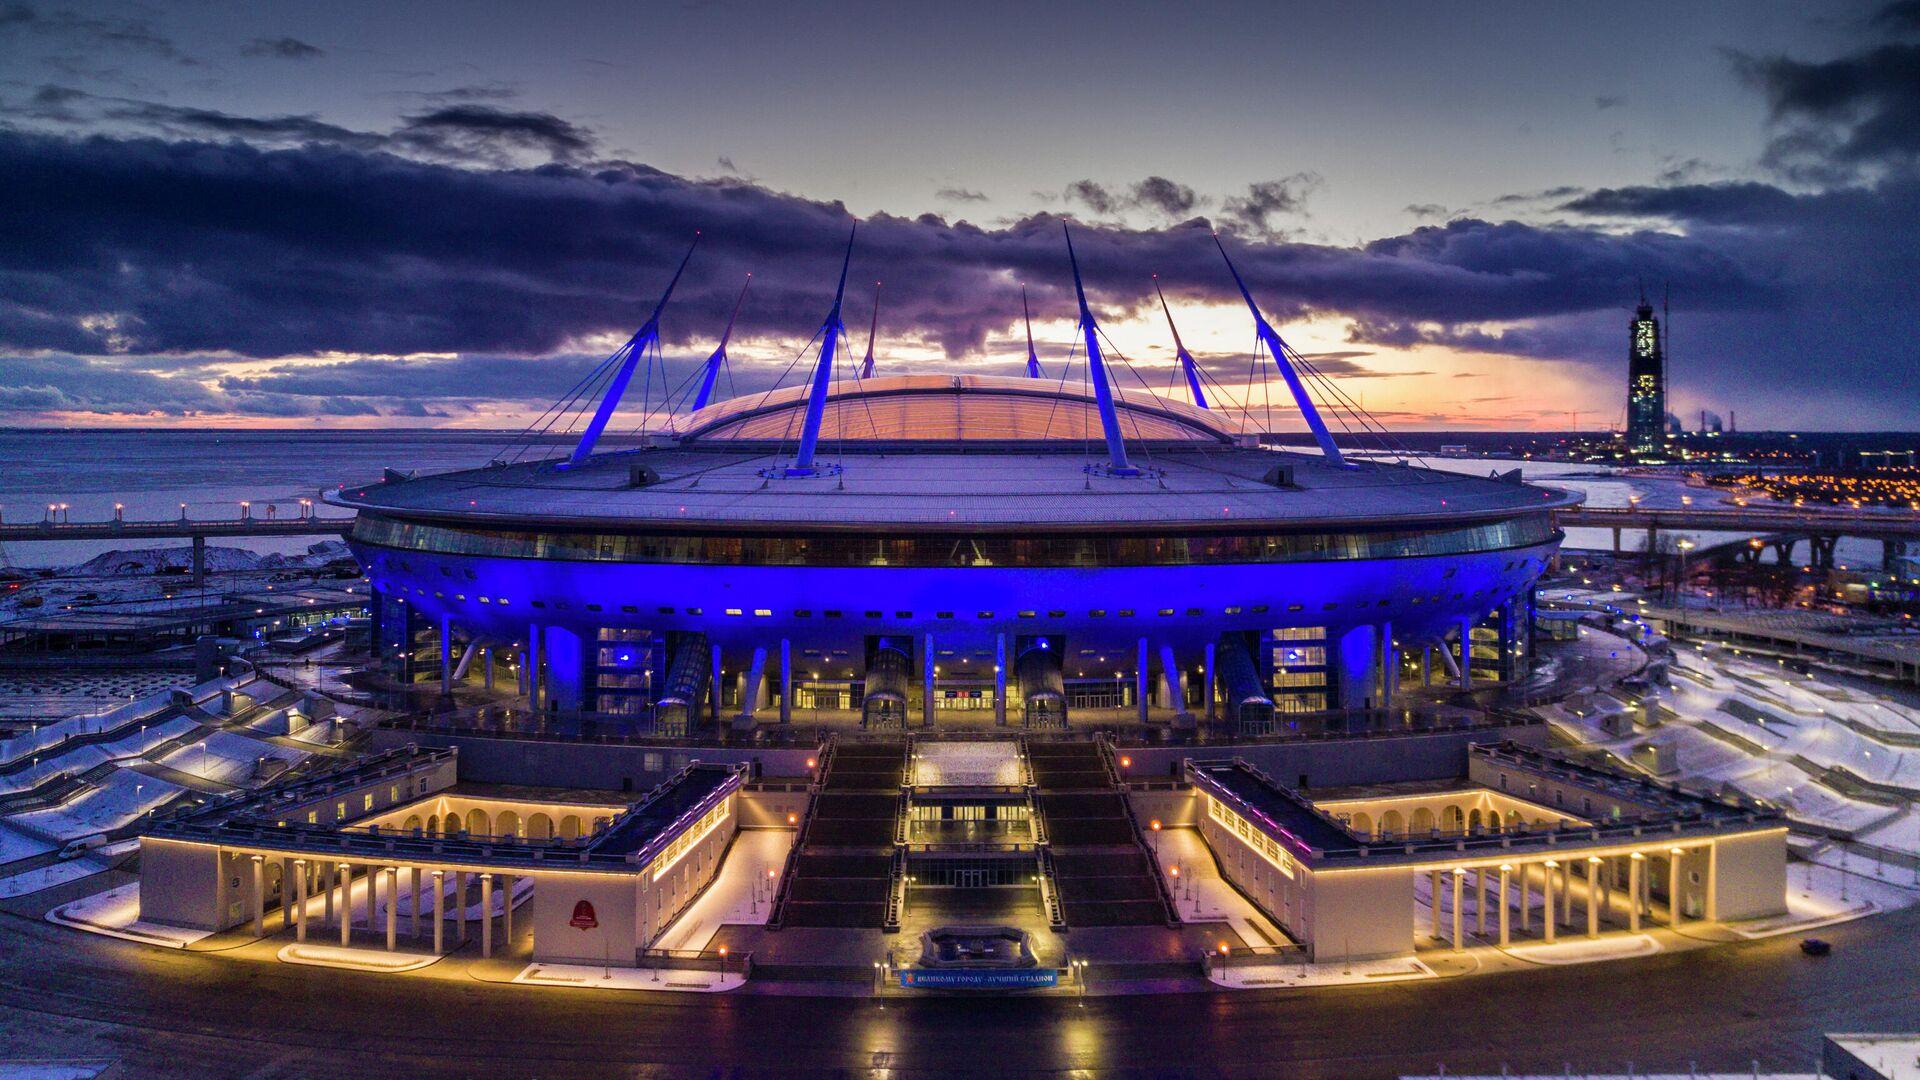 Стадион Санкт-Петербург Арена - РИА Новости, 1920, 22.09.2021